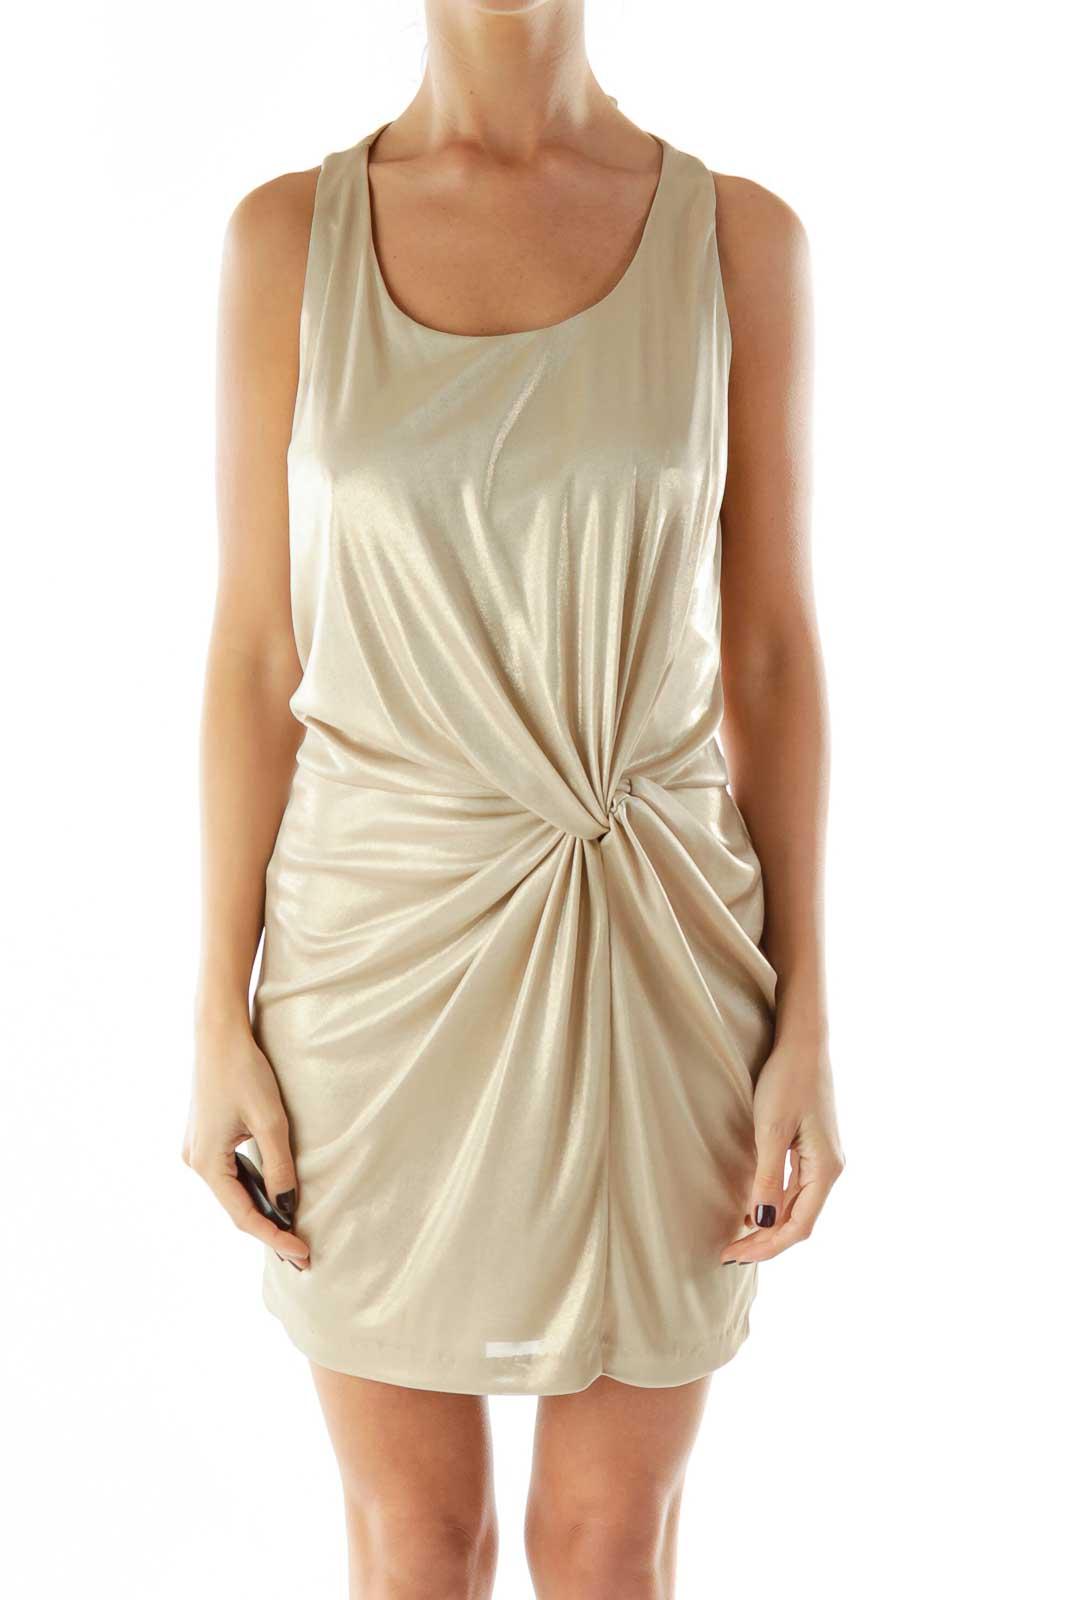 Gold Round Neck Scrunch Detail Cocktail Dress Front